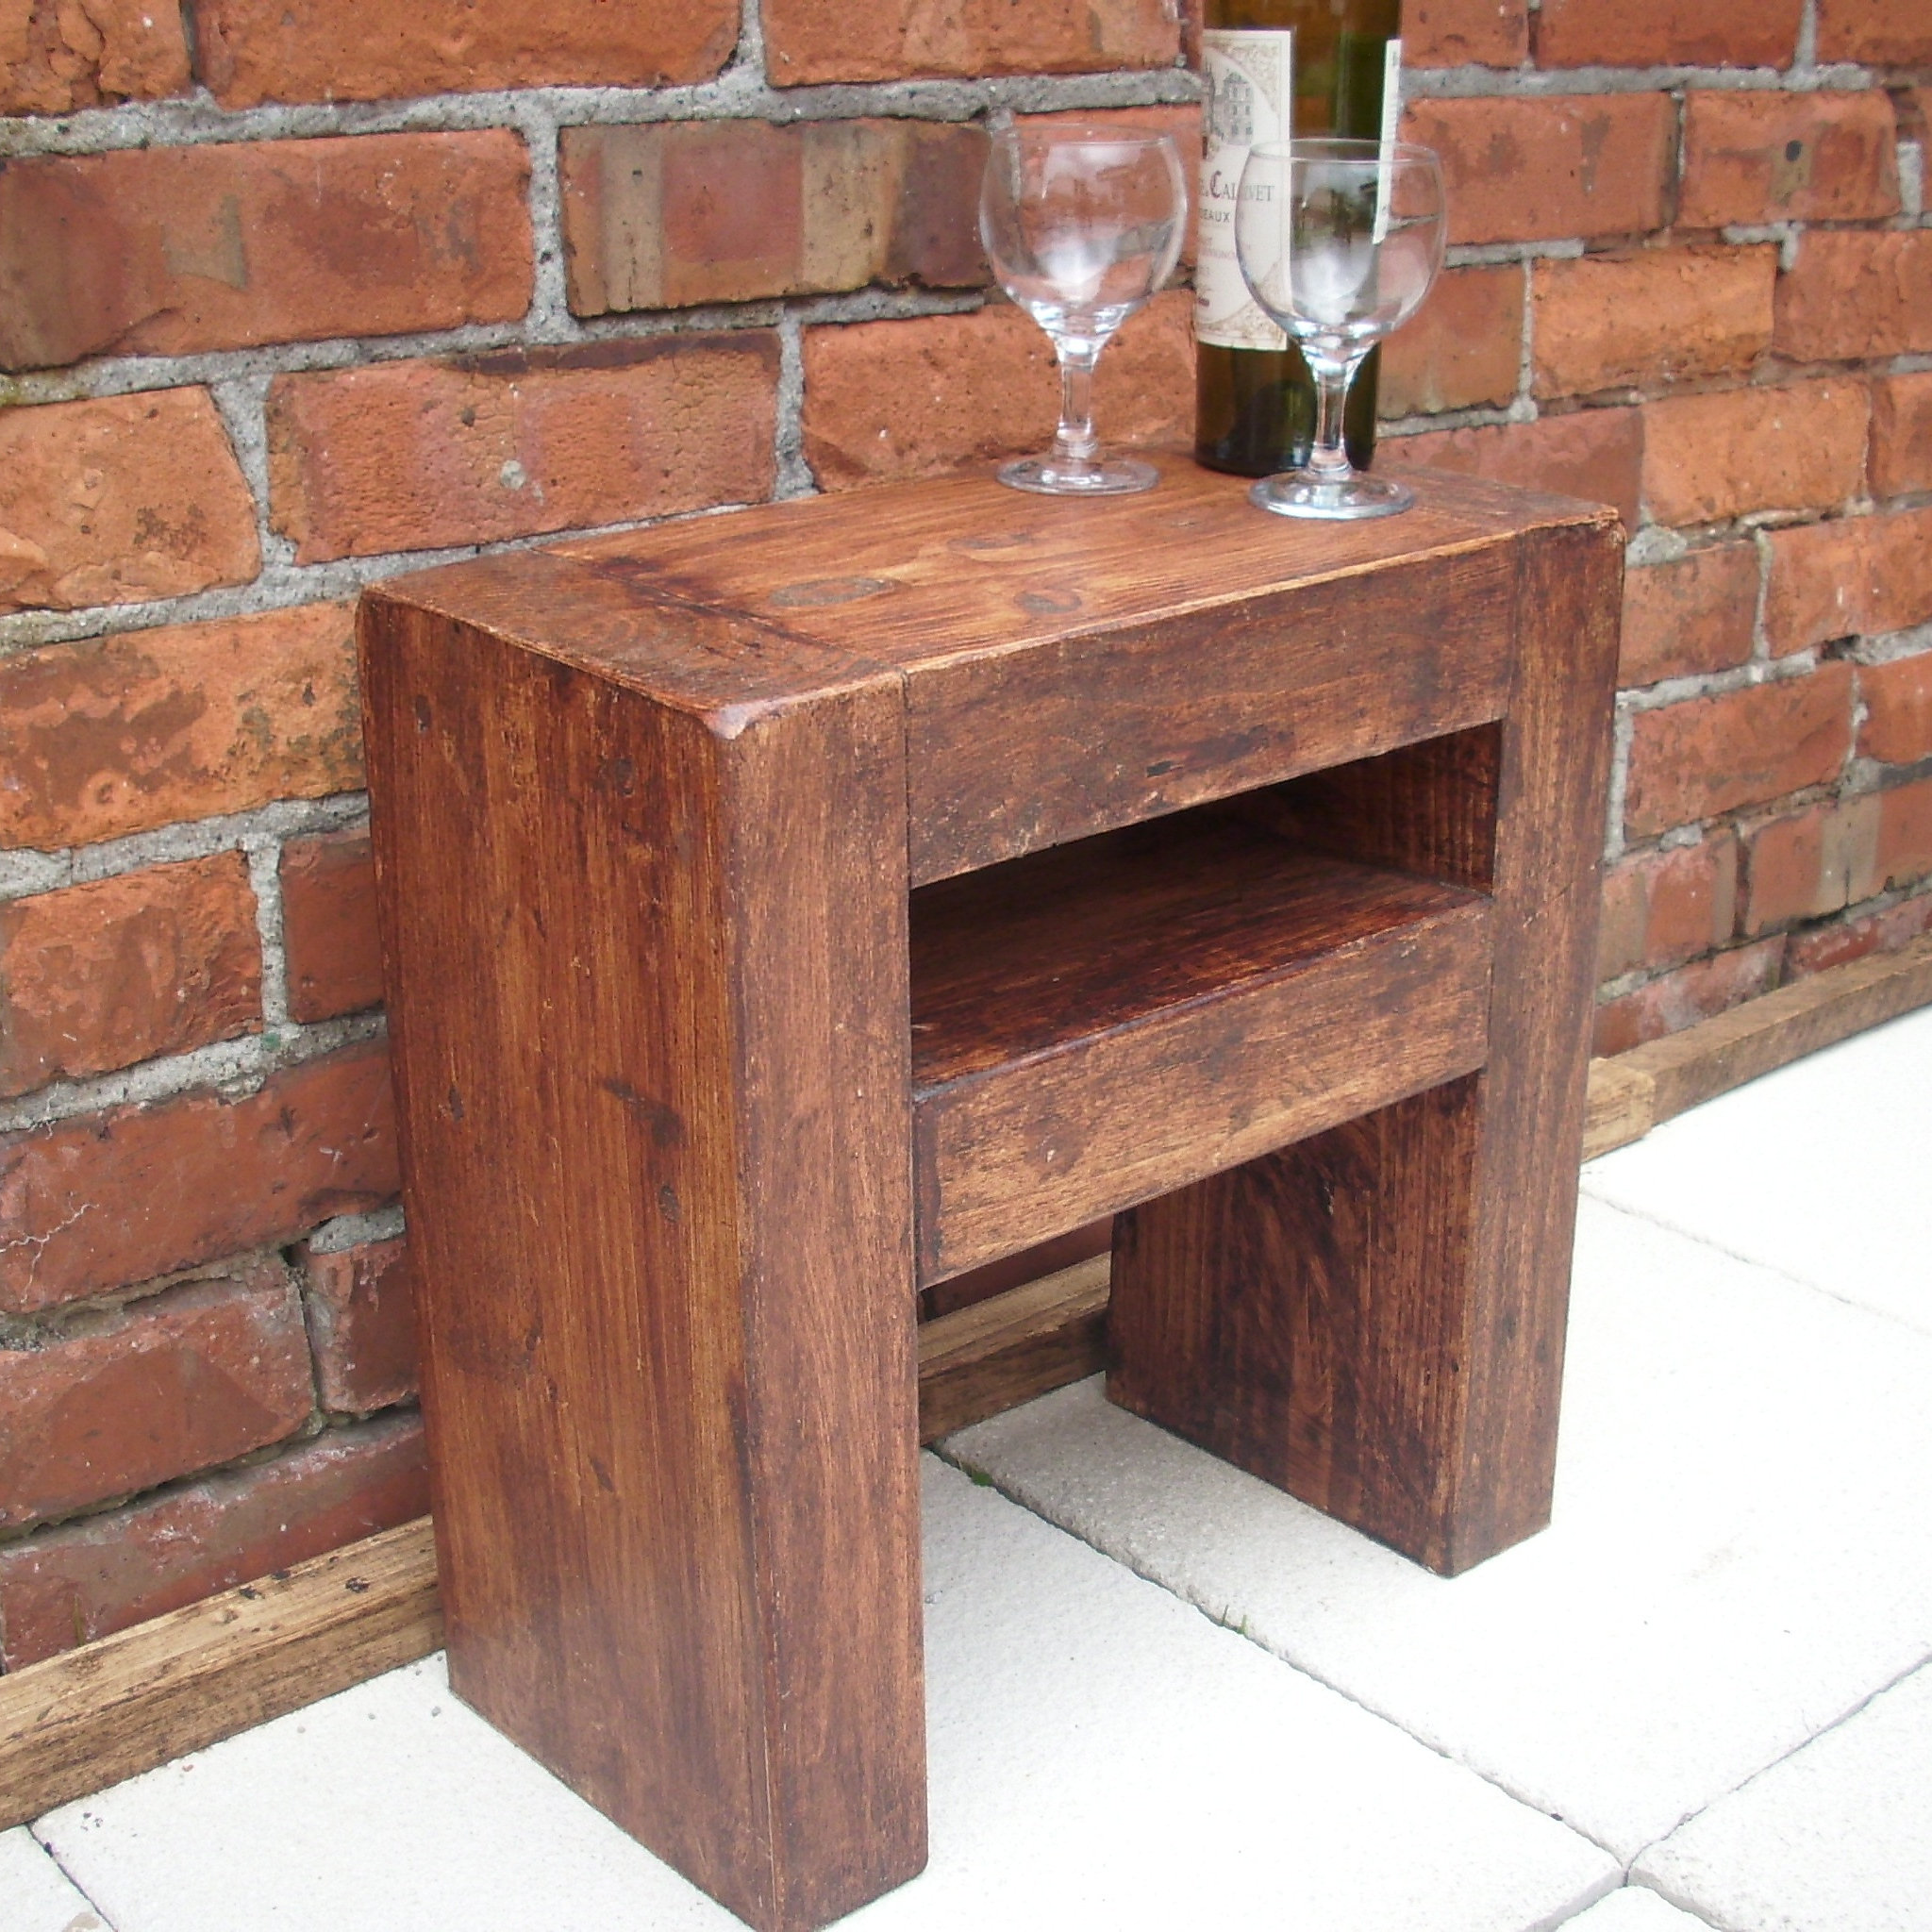 Bedside Table Rustic Wood